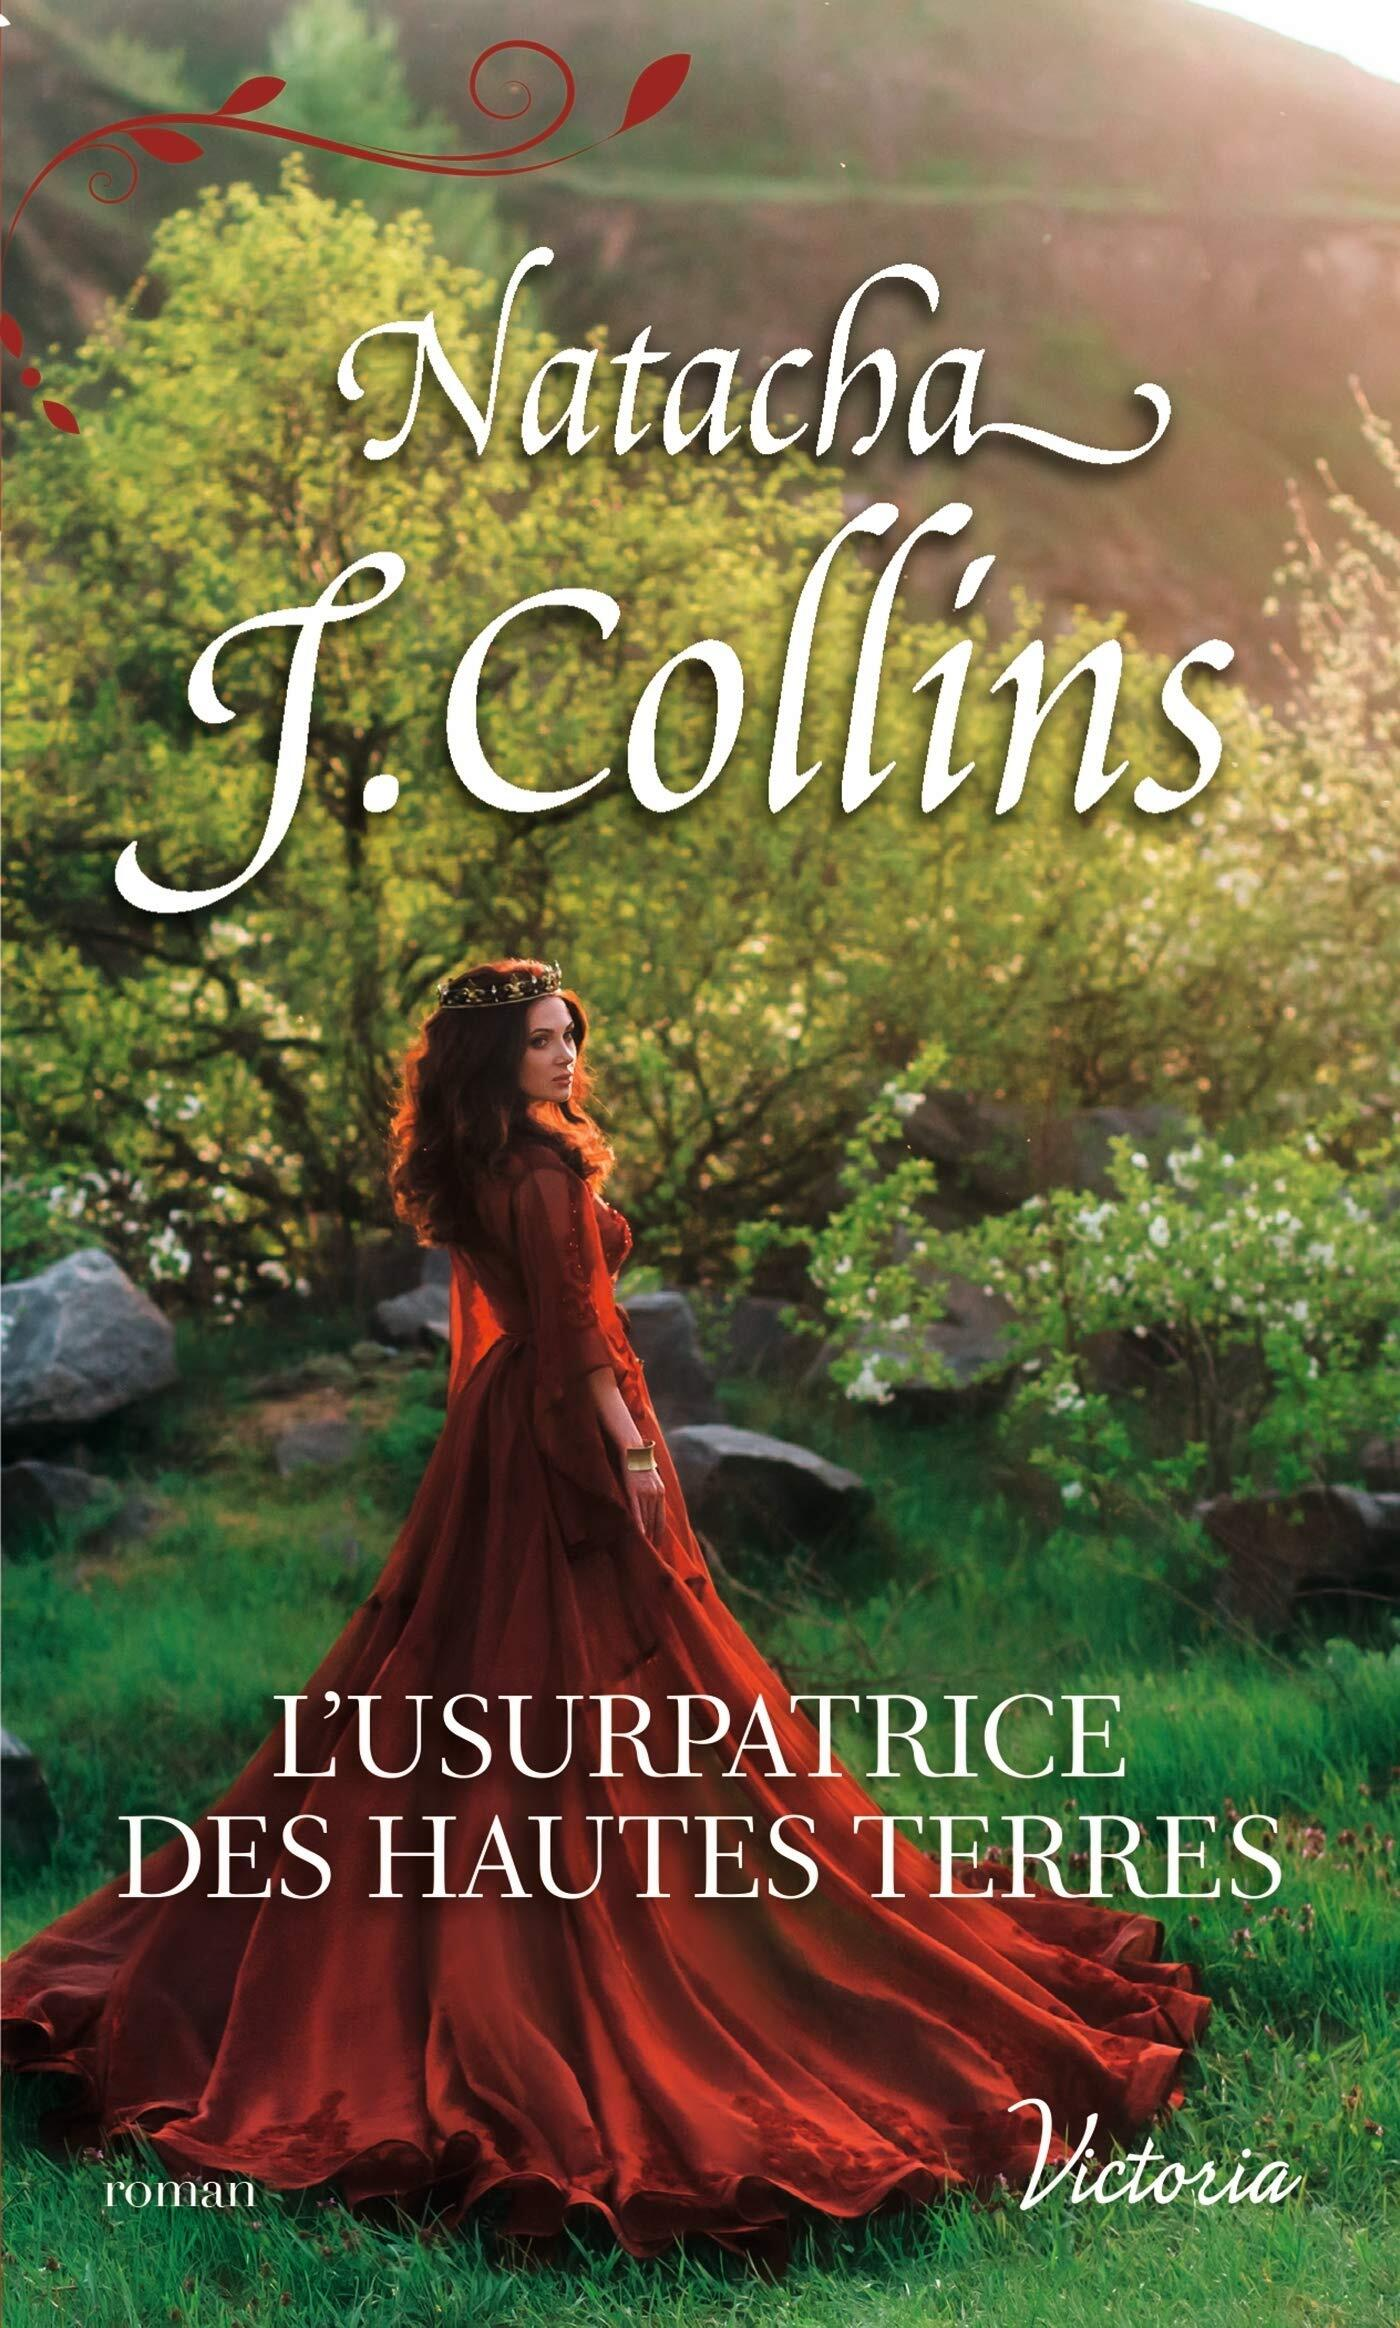 cdn1.booknode.com/book_cover/1288/full/le-souffle-des-highlands-tome-4-l-usurpatrice-des-hautes-terres-1287977.jpg